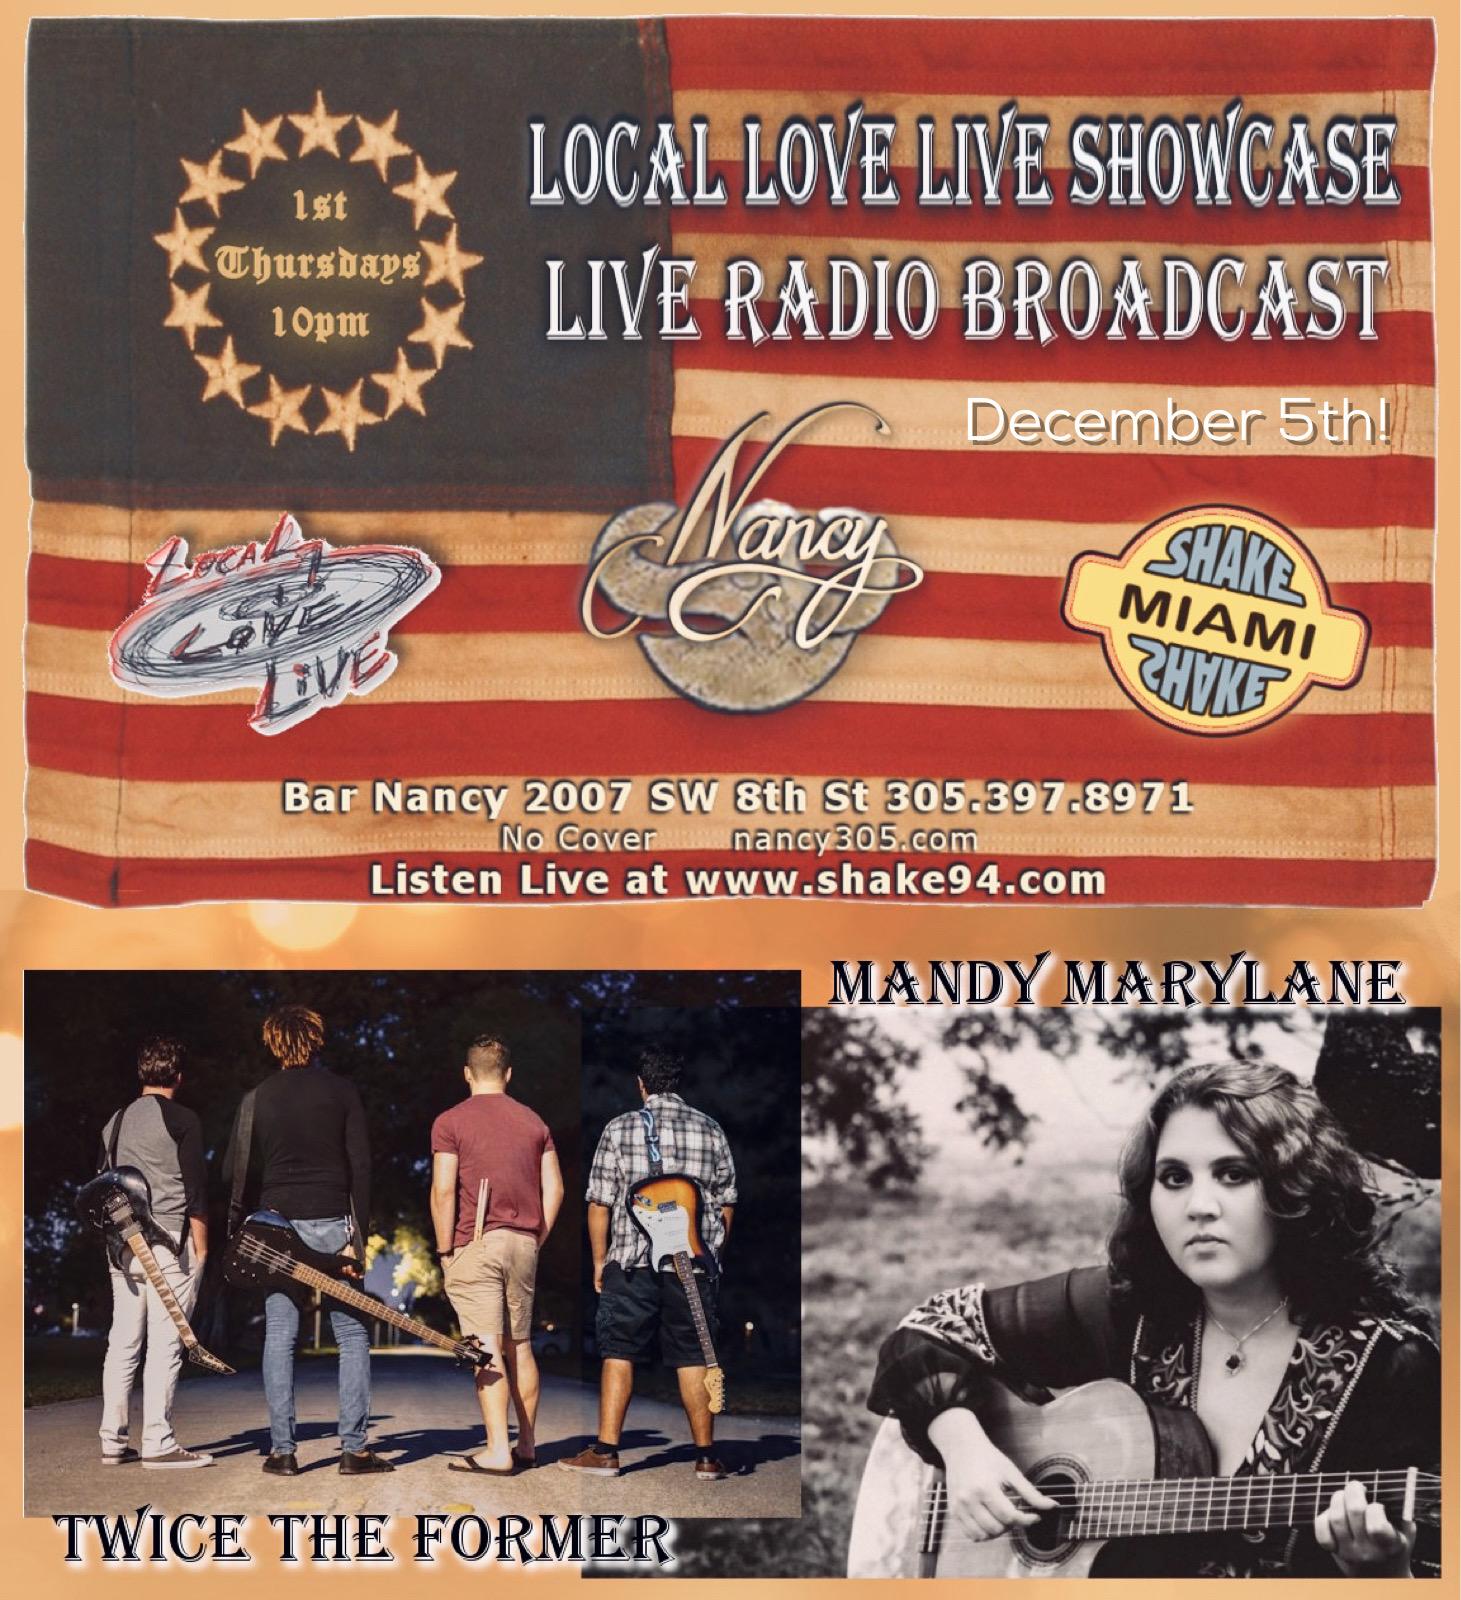 Local Love Live Showcase & Live Radio Broadcast! @ Bar Nancy